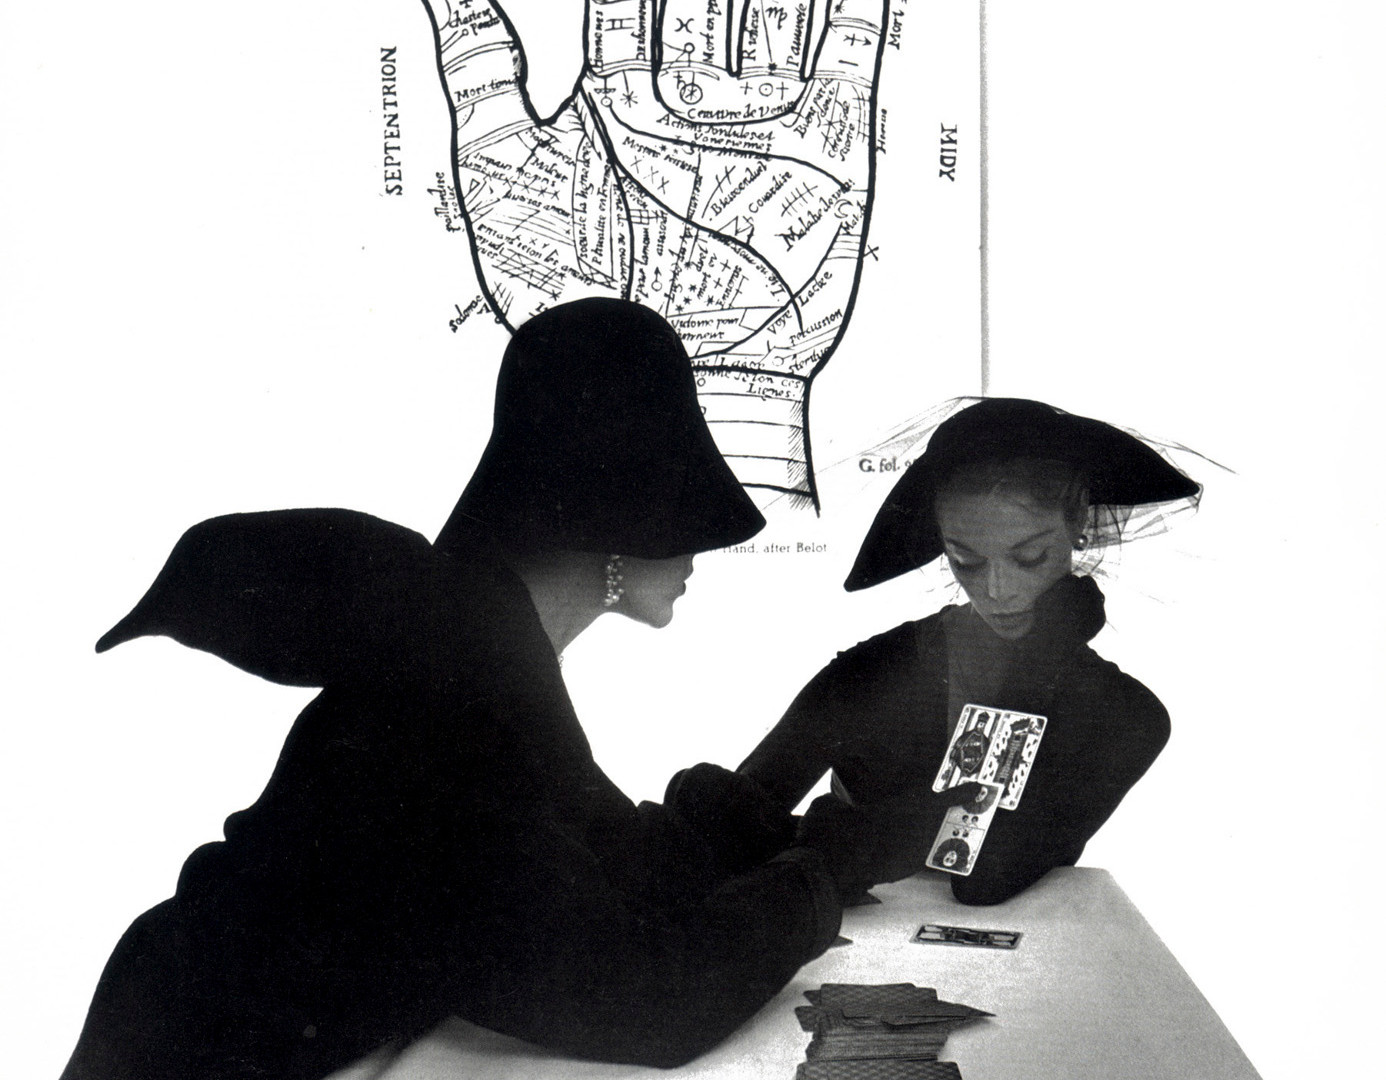 Irving Penn, The Tarot Reader (Jean Patchett & Bridget Tichenor), 1949